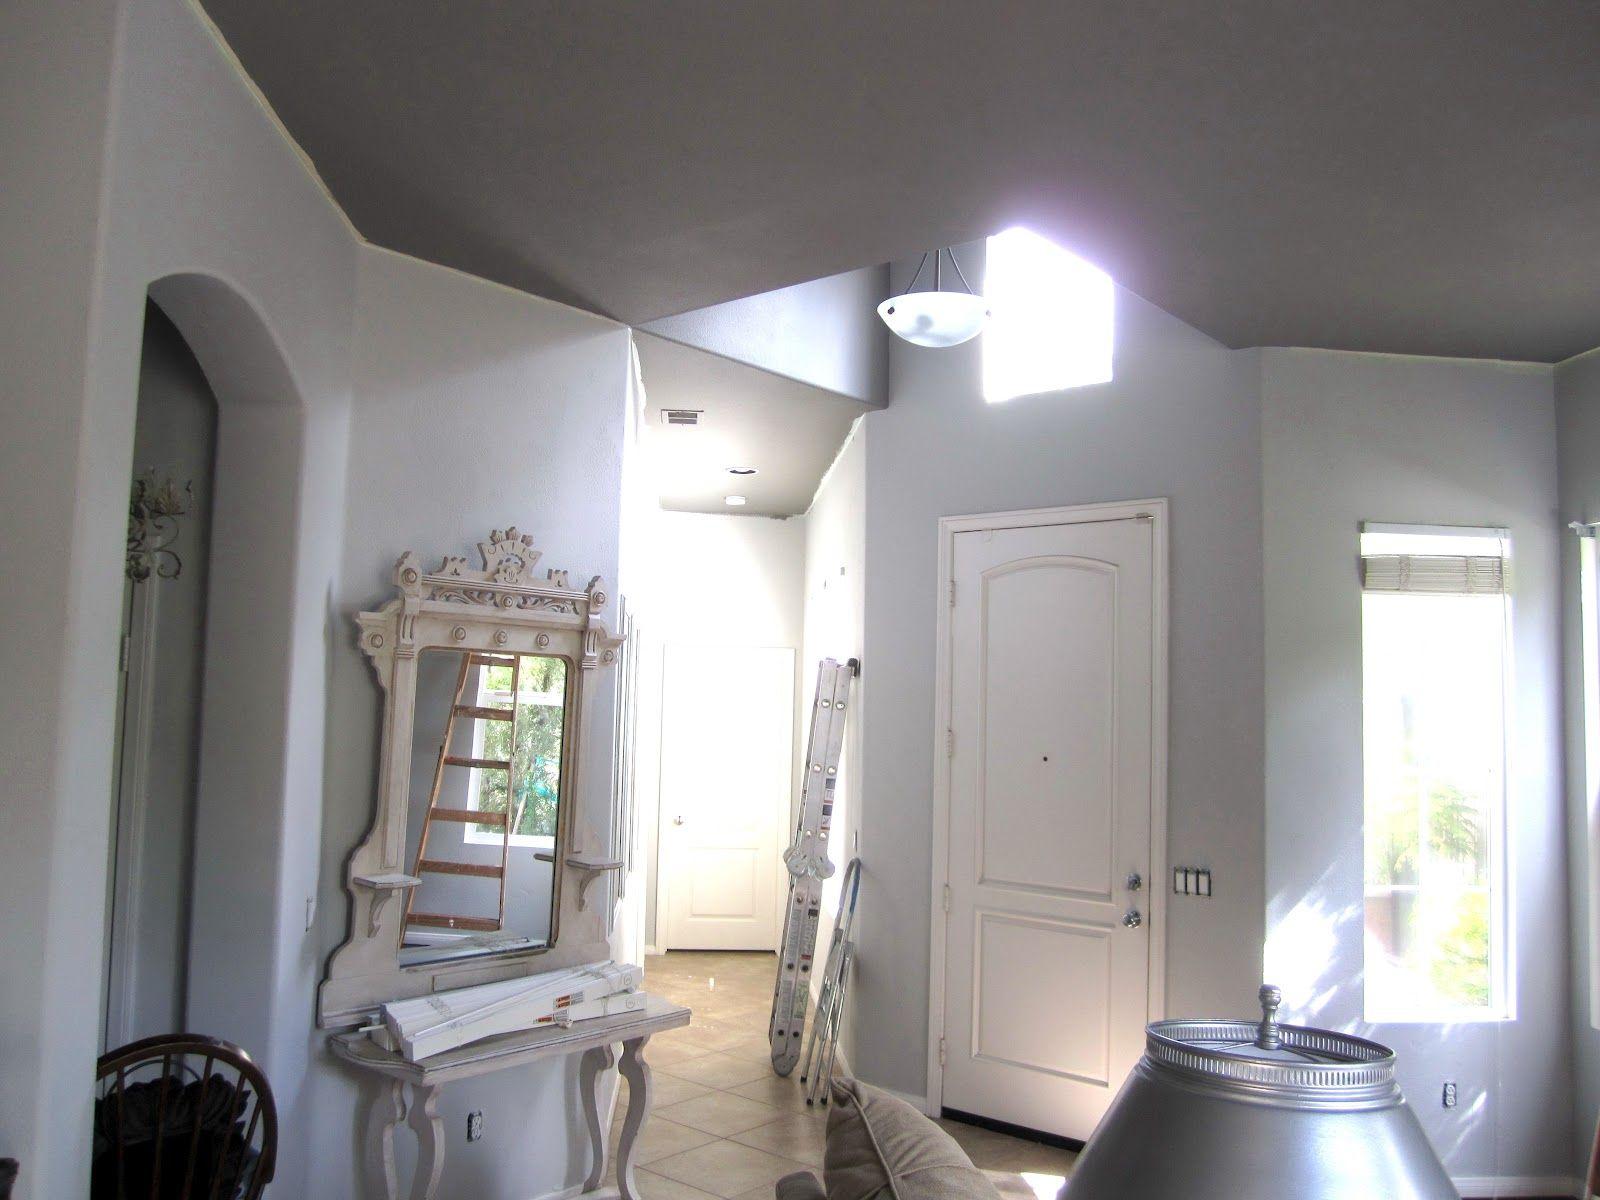 stonington gray walls and chelsea gray ceiling. love the combo